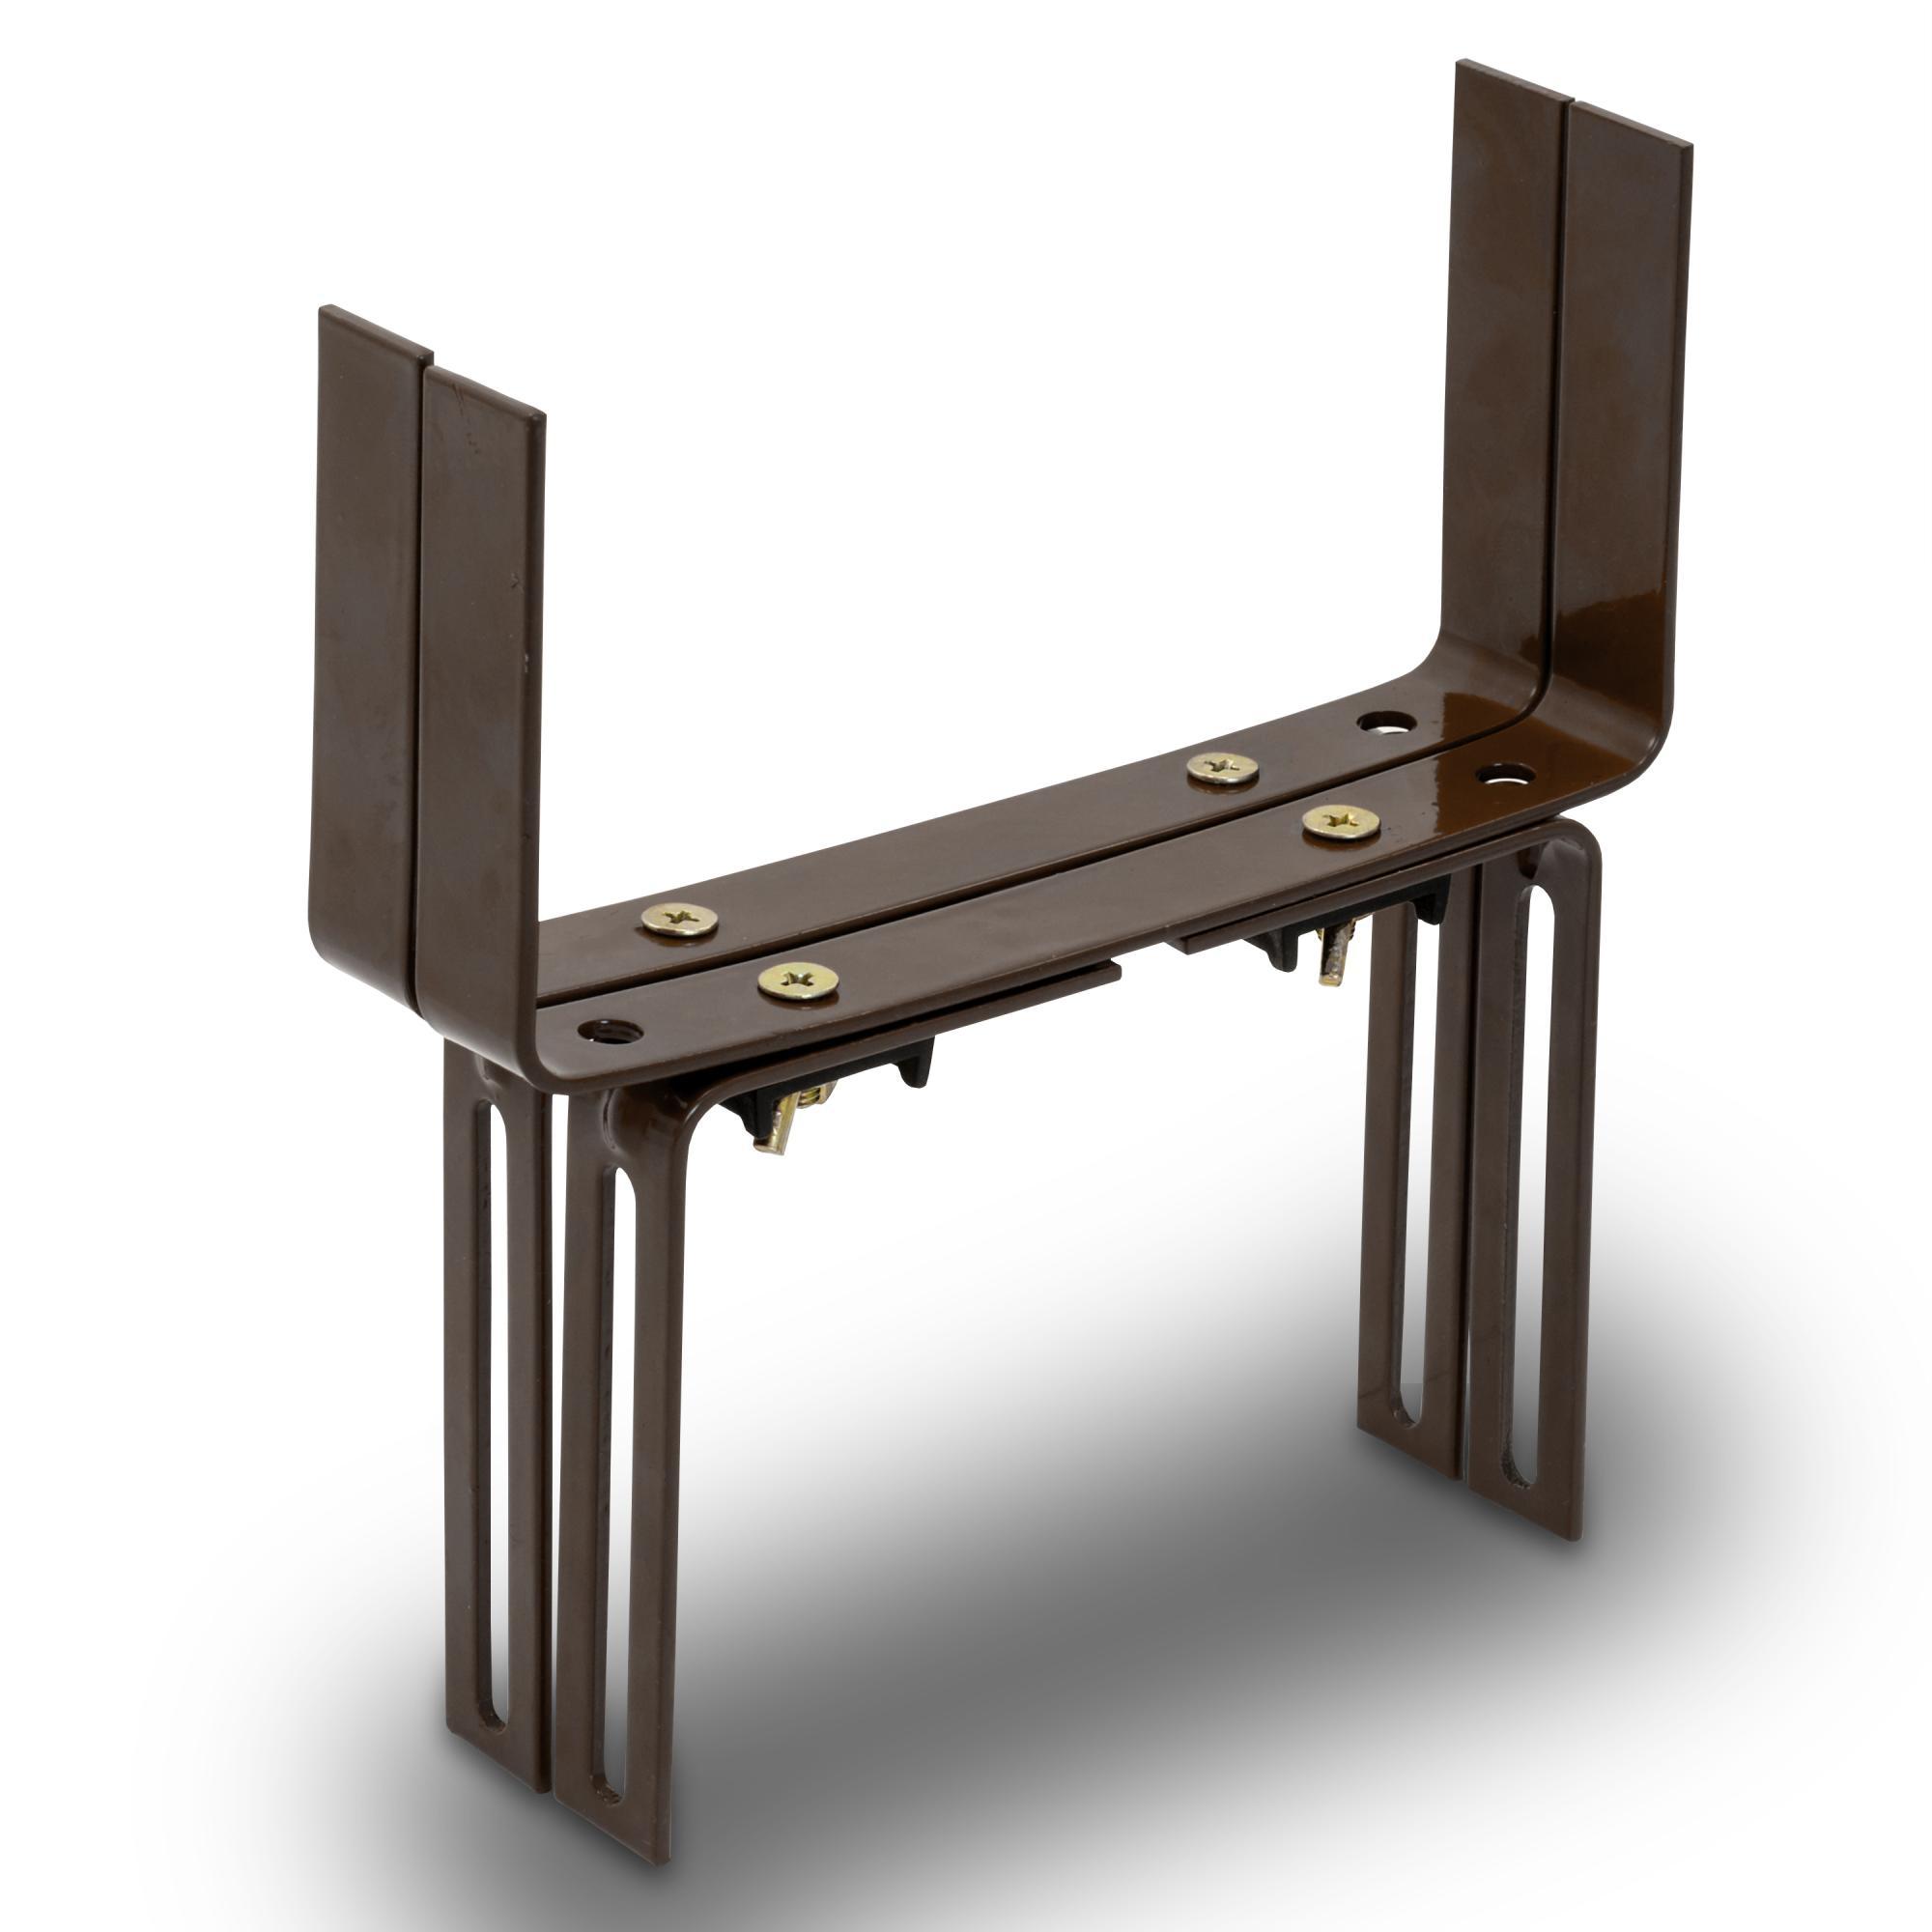 2 blumenkastenhalter blumenkasten balkonkasten halter. Black Bedroom Furniture Sets. Home Design Ideas